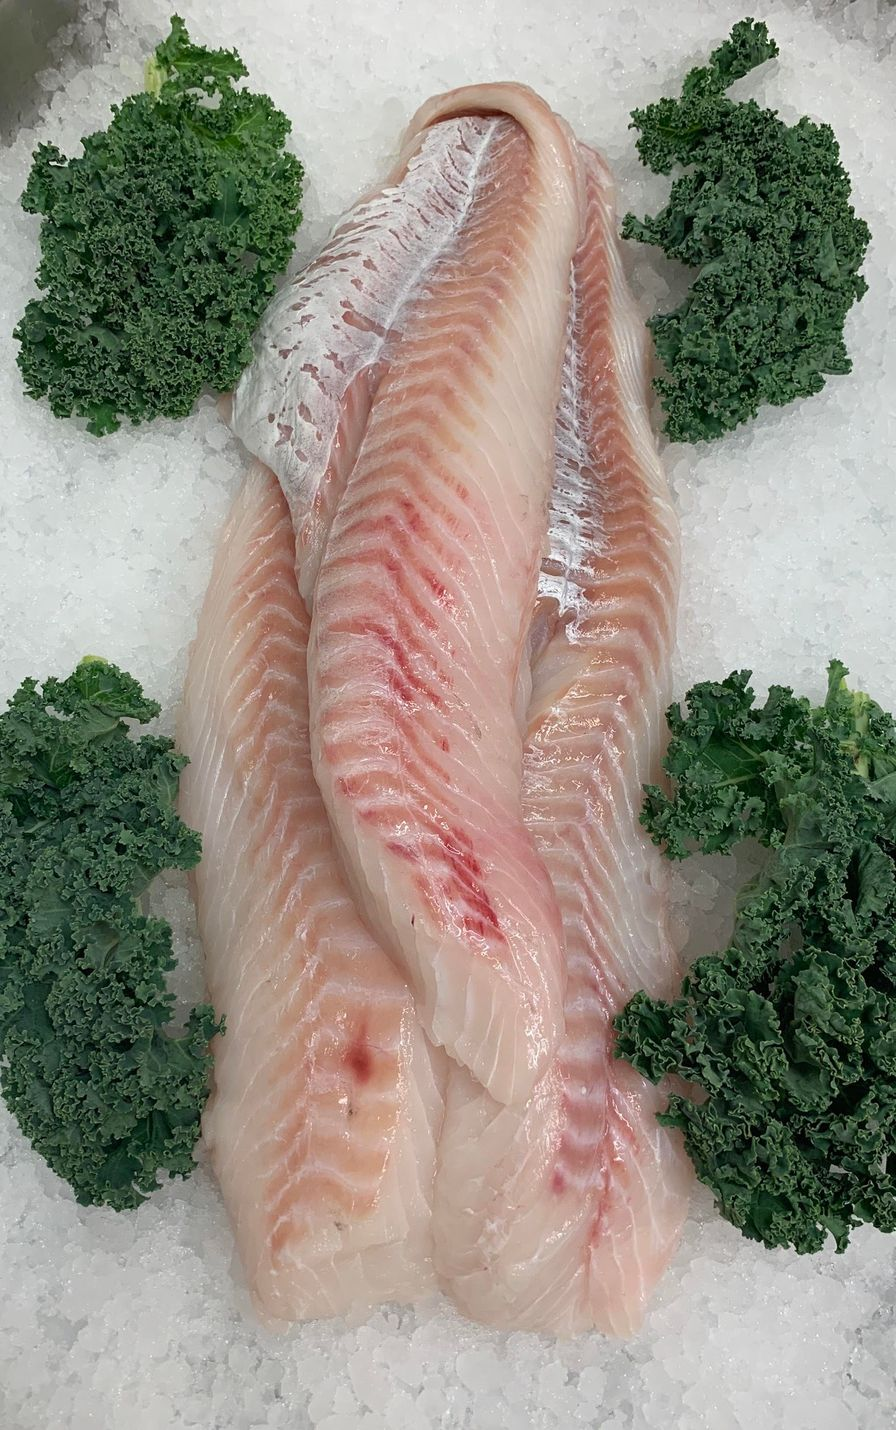 Wild Icelandic Cod Fillet